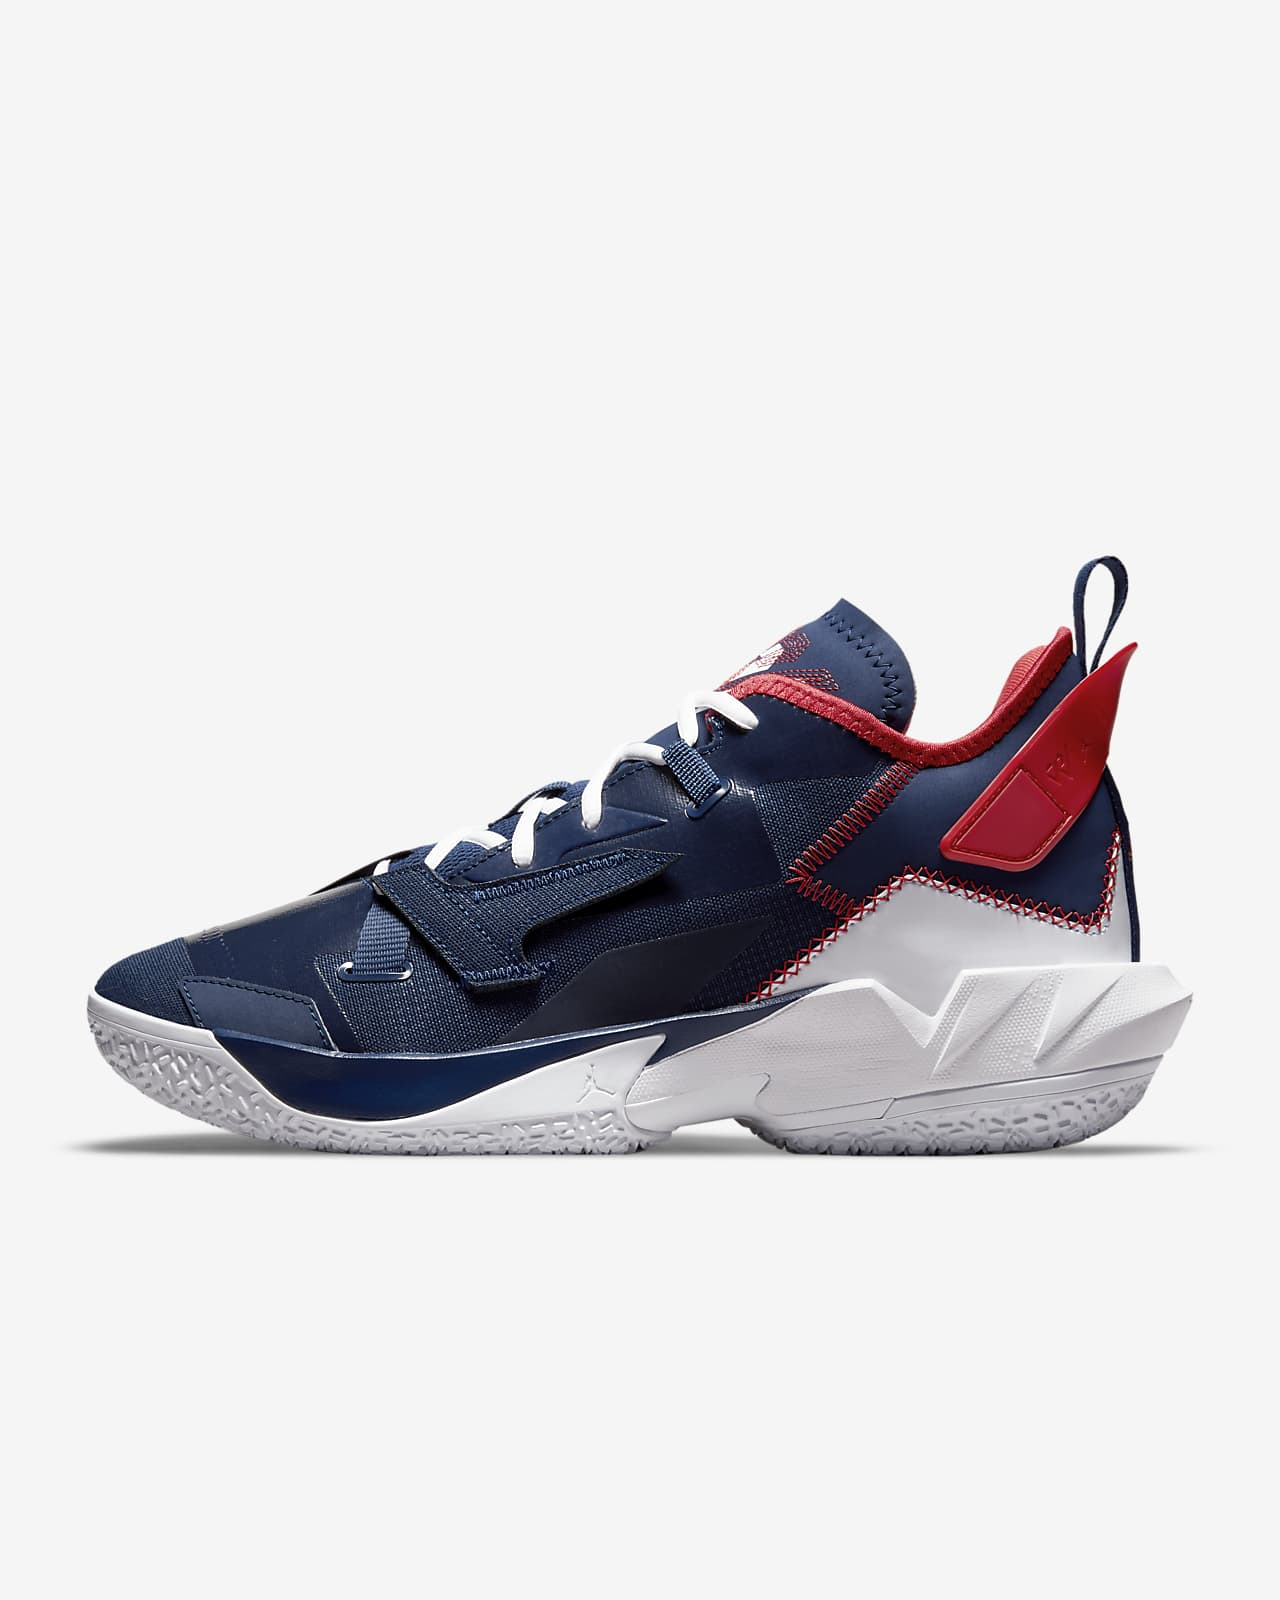 Jordan 'Why Not?' Zer0.4 PF Basketball Shoe